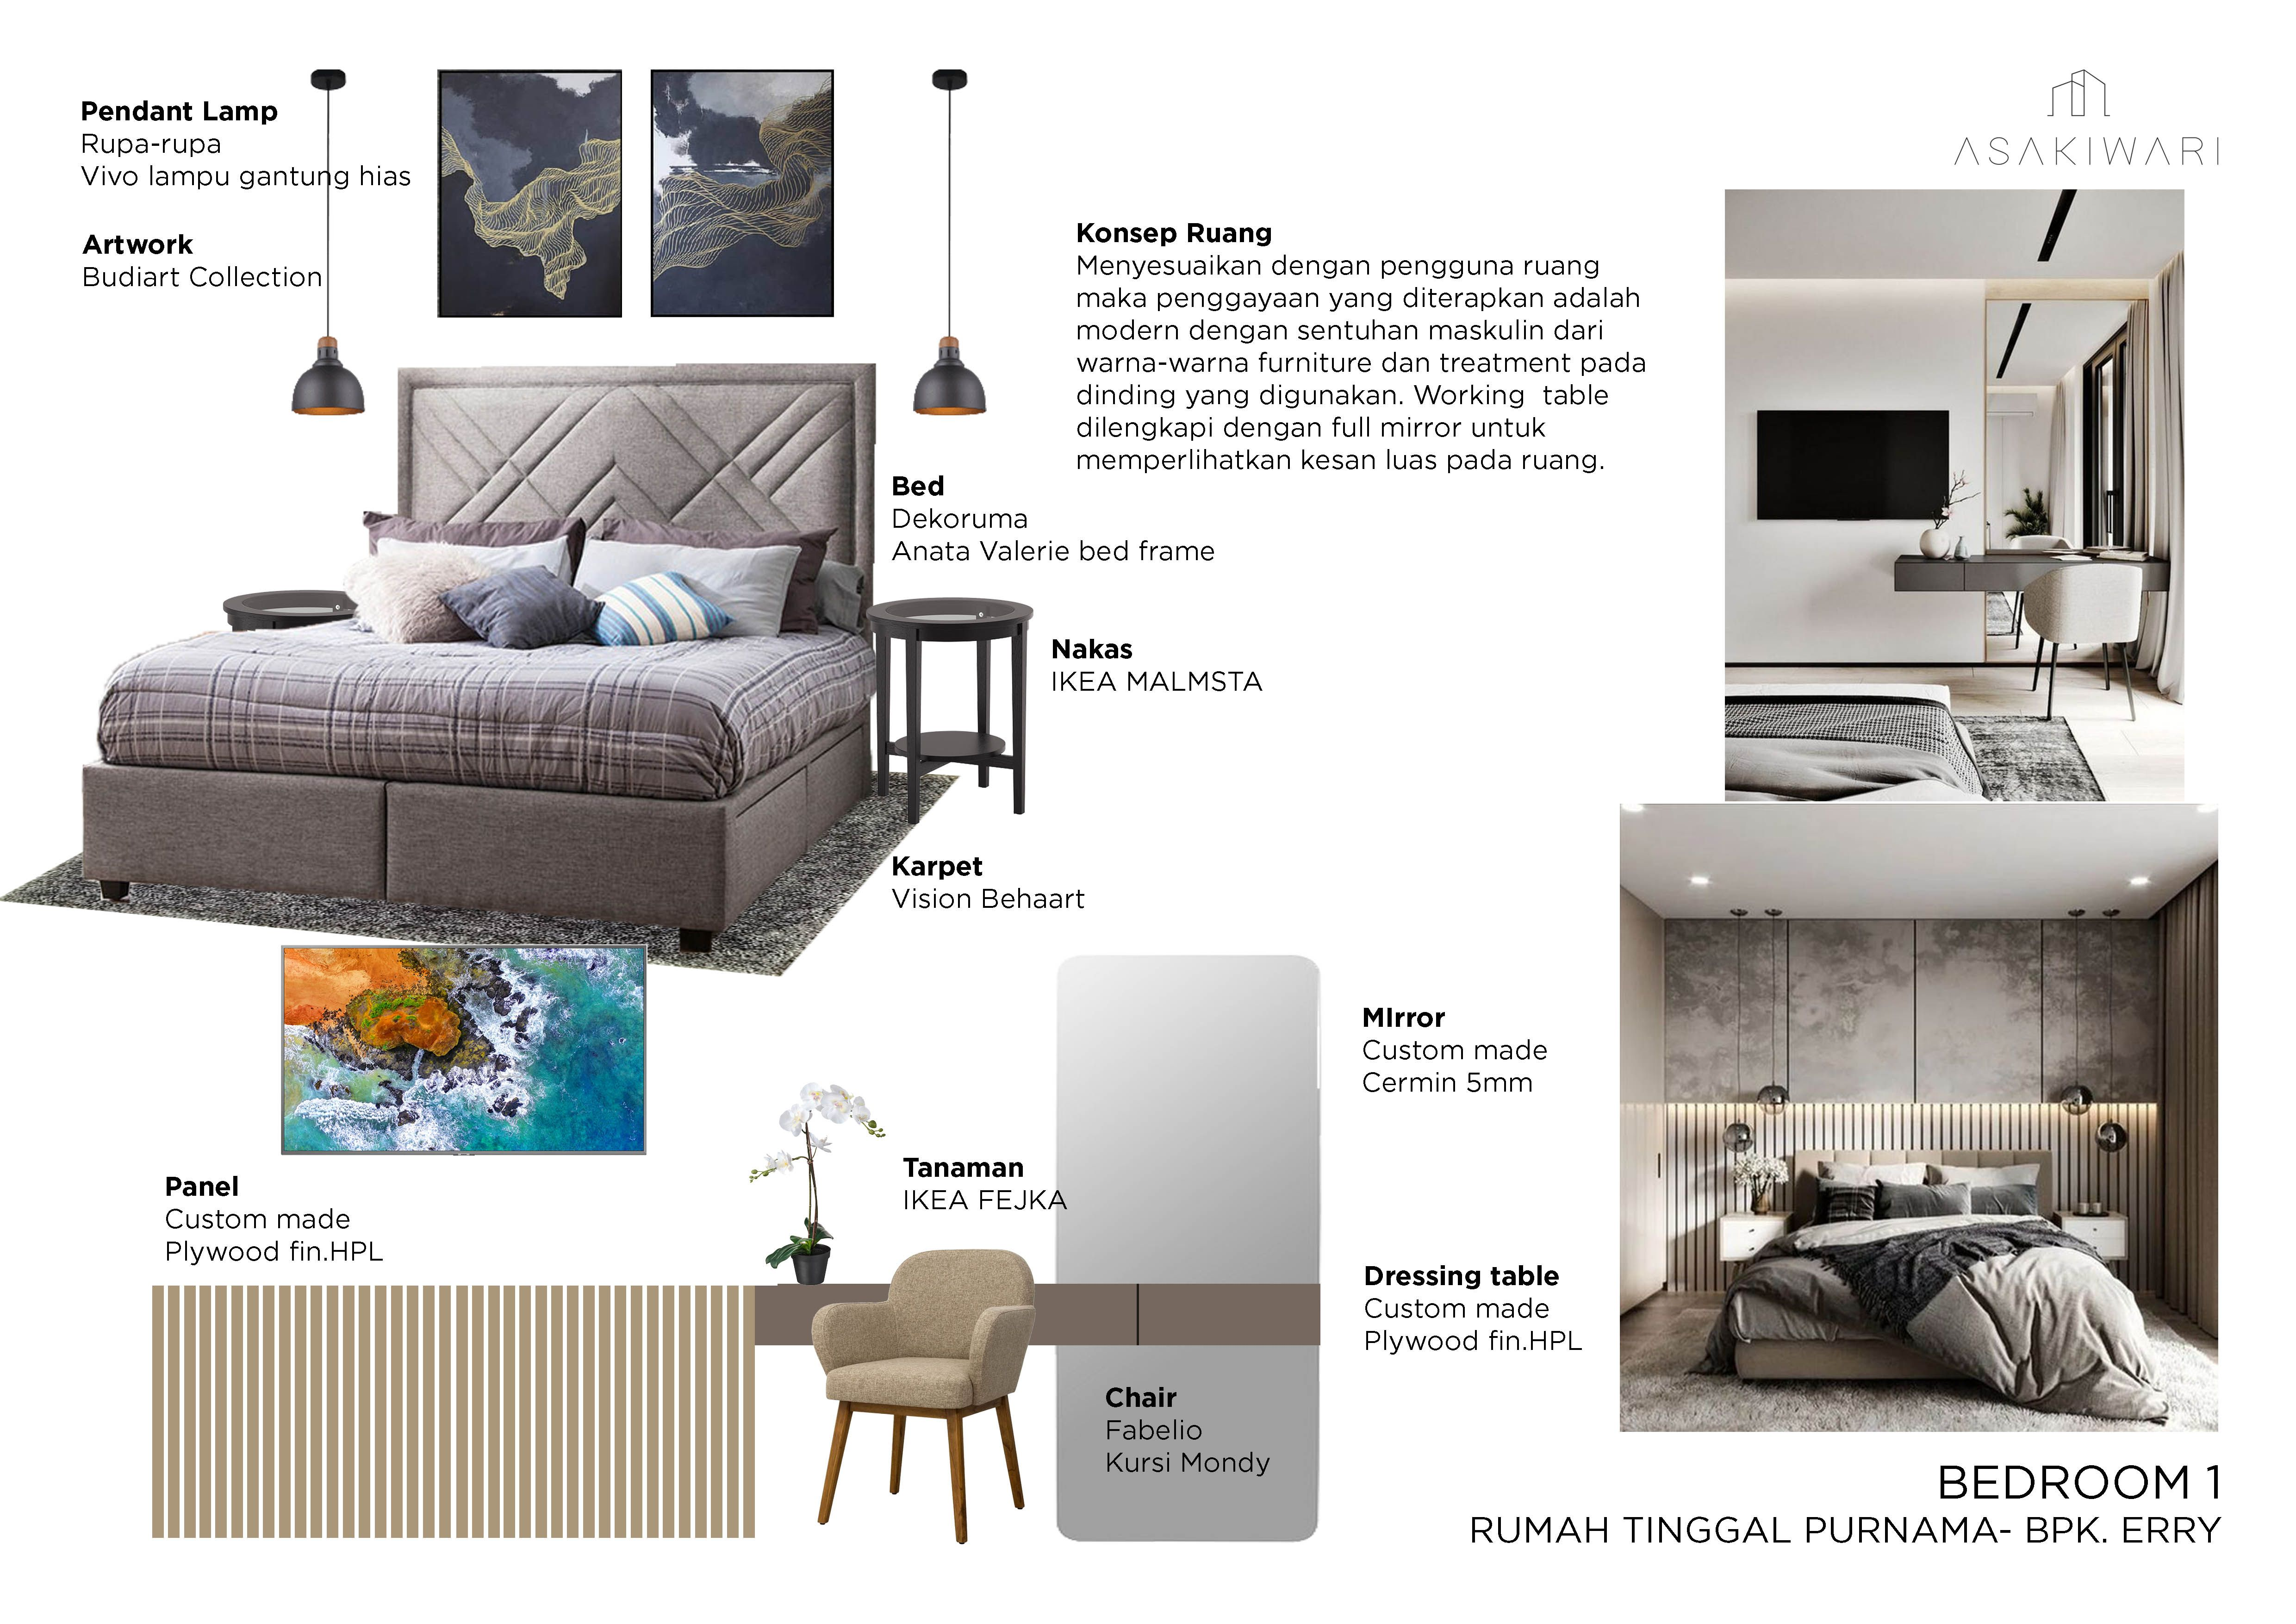 Pin Oleh Eva Ristiani Di Moodboard Nature Home Design Modern bedroom maskulin design